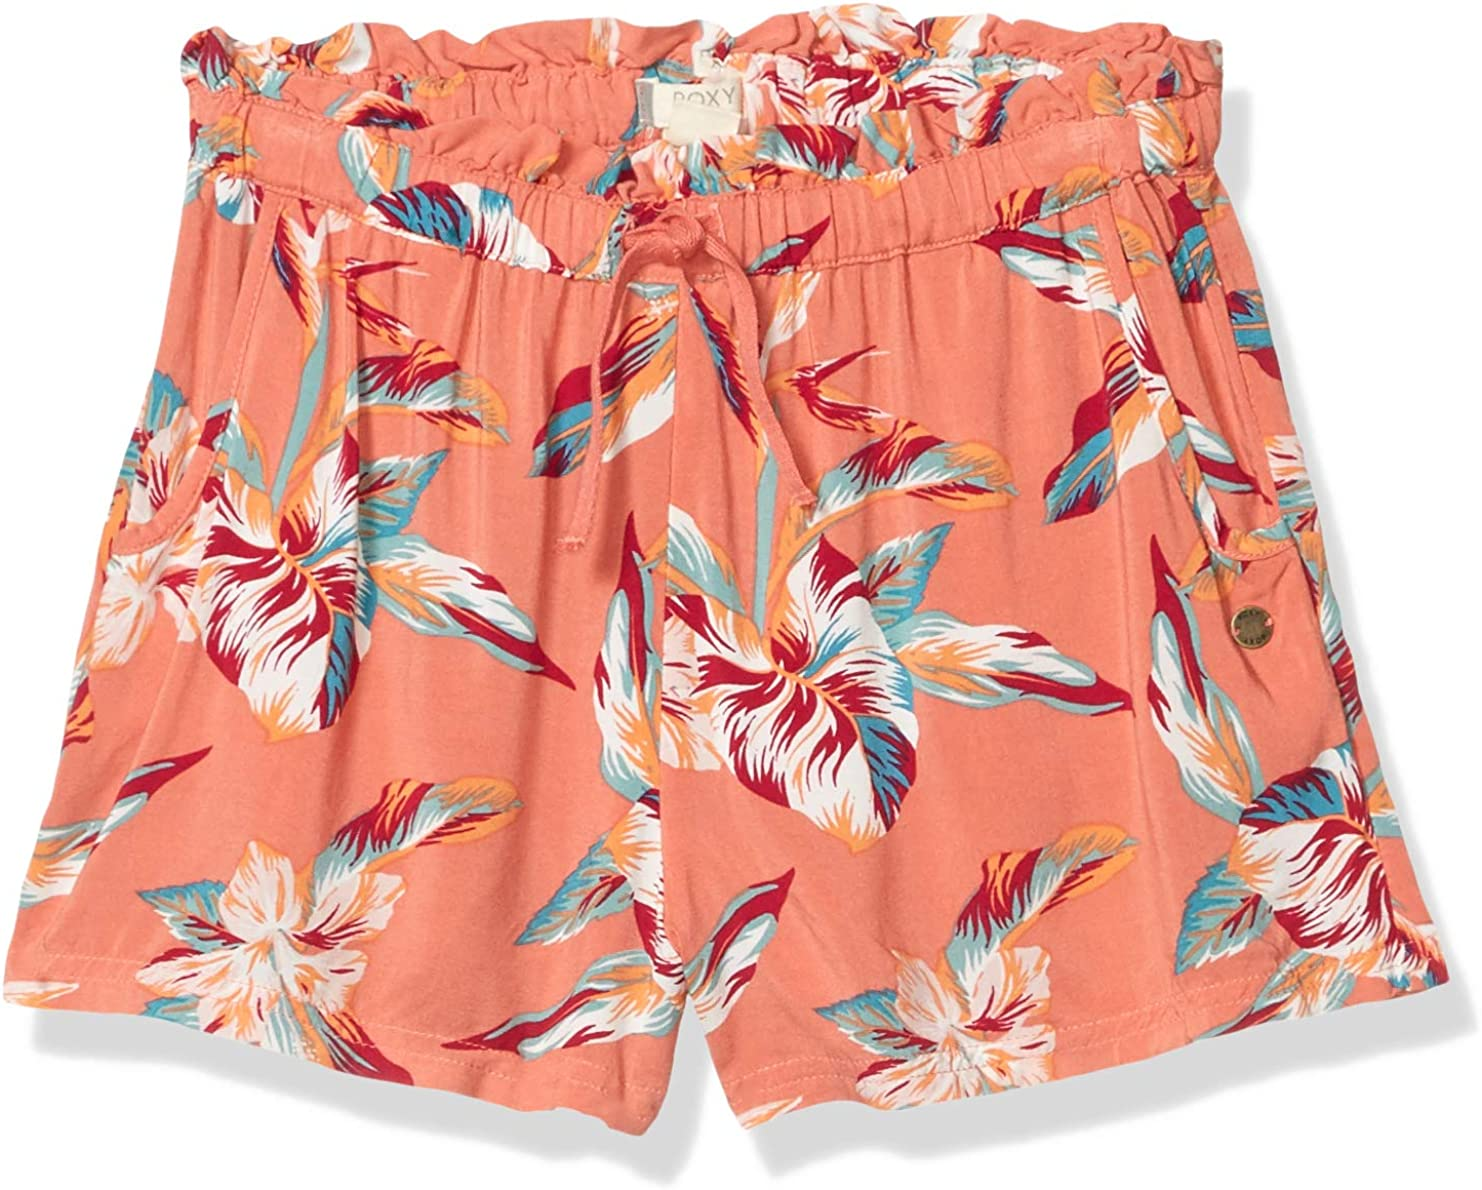 Roxy Girls Big Old Dreamer Beach Shorts